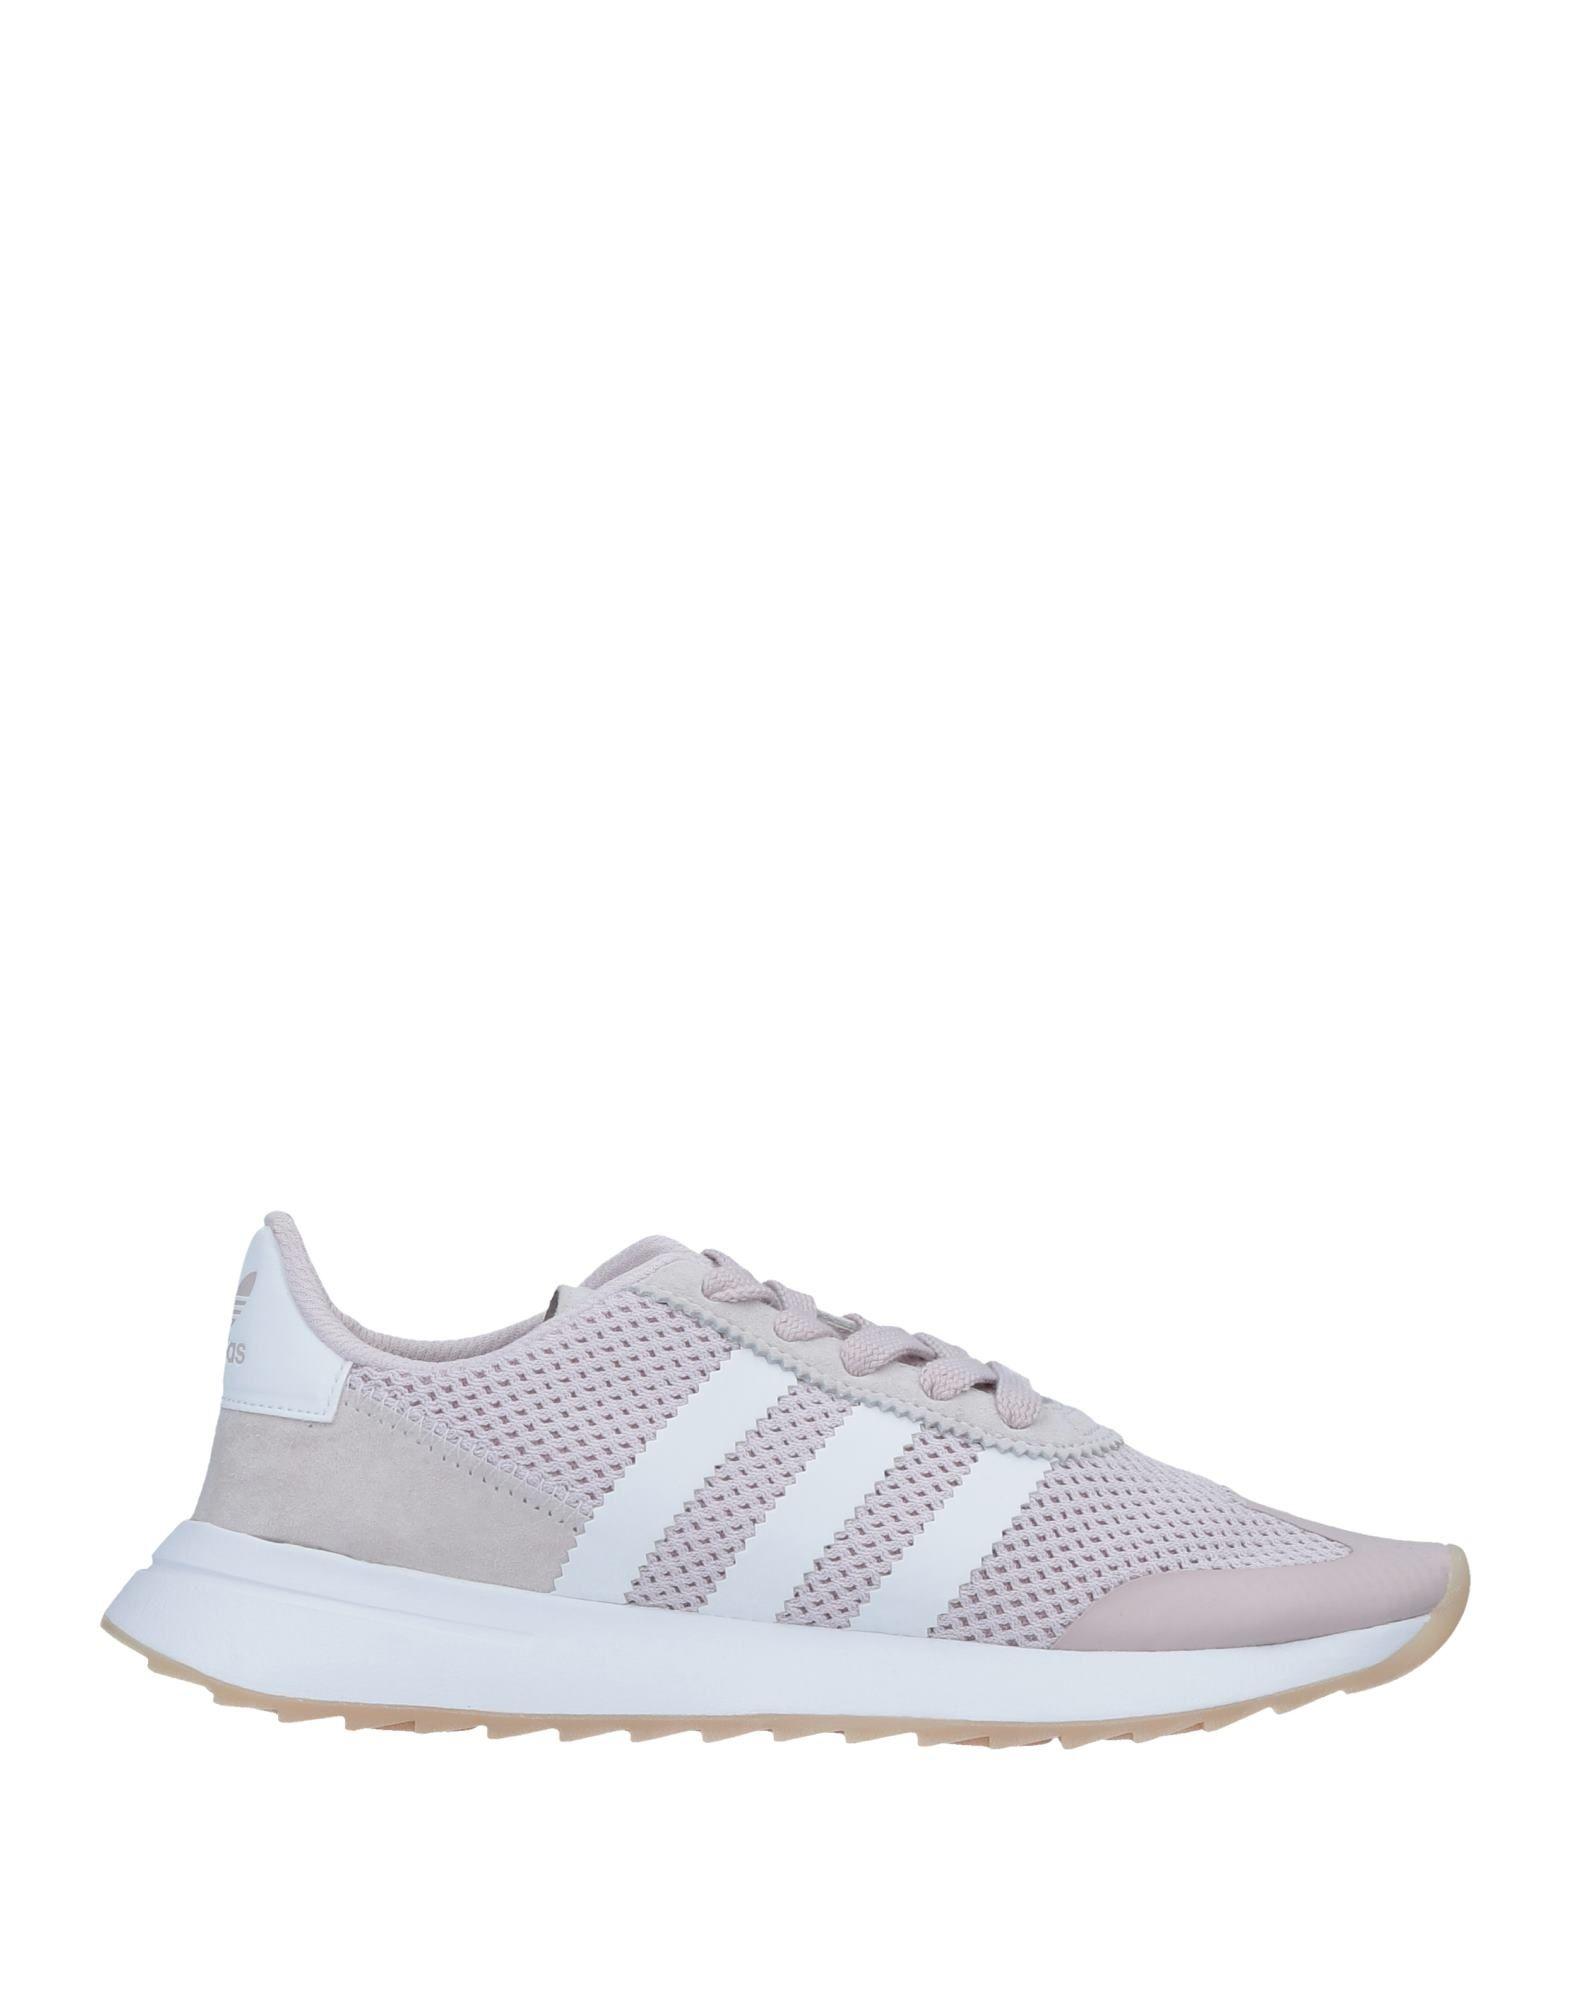 Adidas Originals Sneakers Damen  11504381QO Gute Qualität beliebte Schuhe